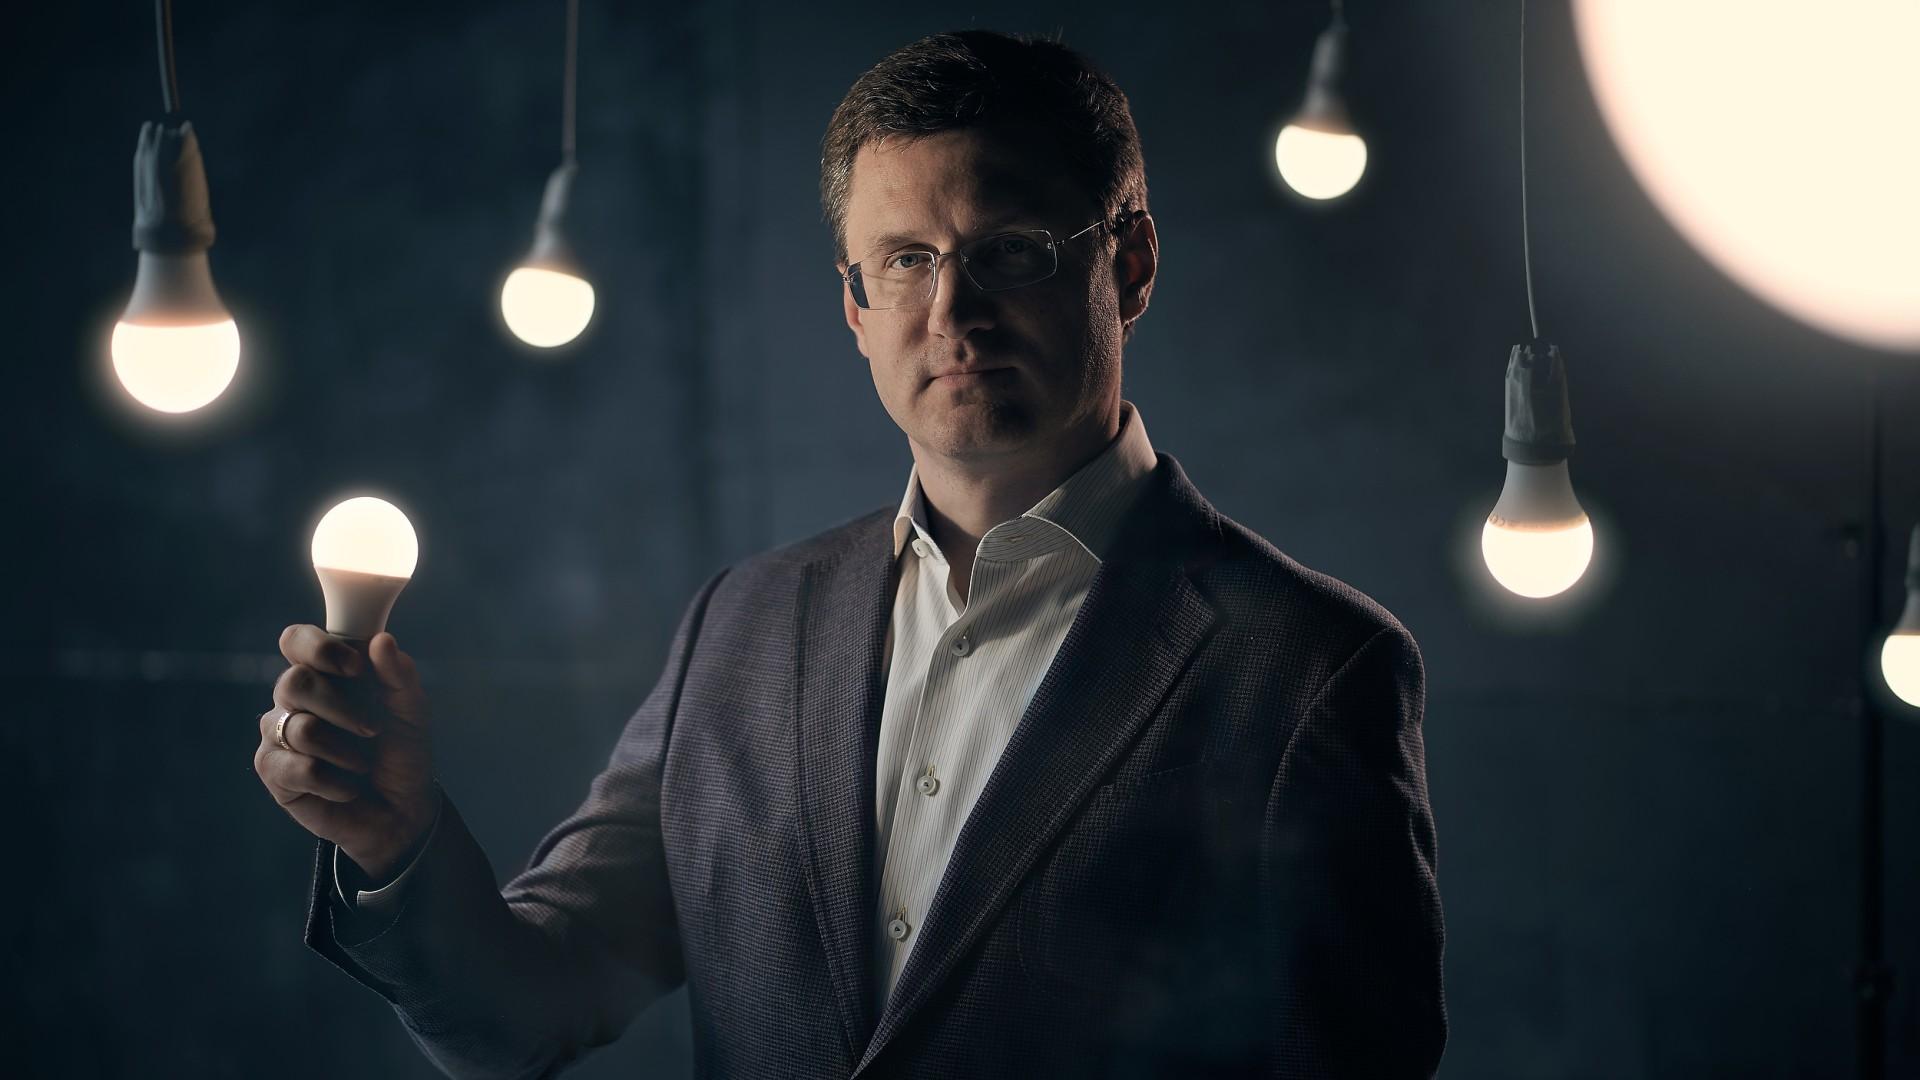 Alexander Novak, Russia's Minister of Energy